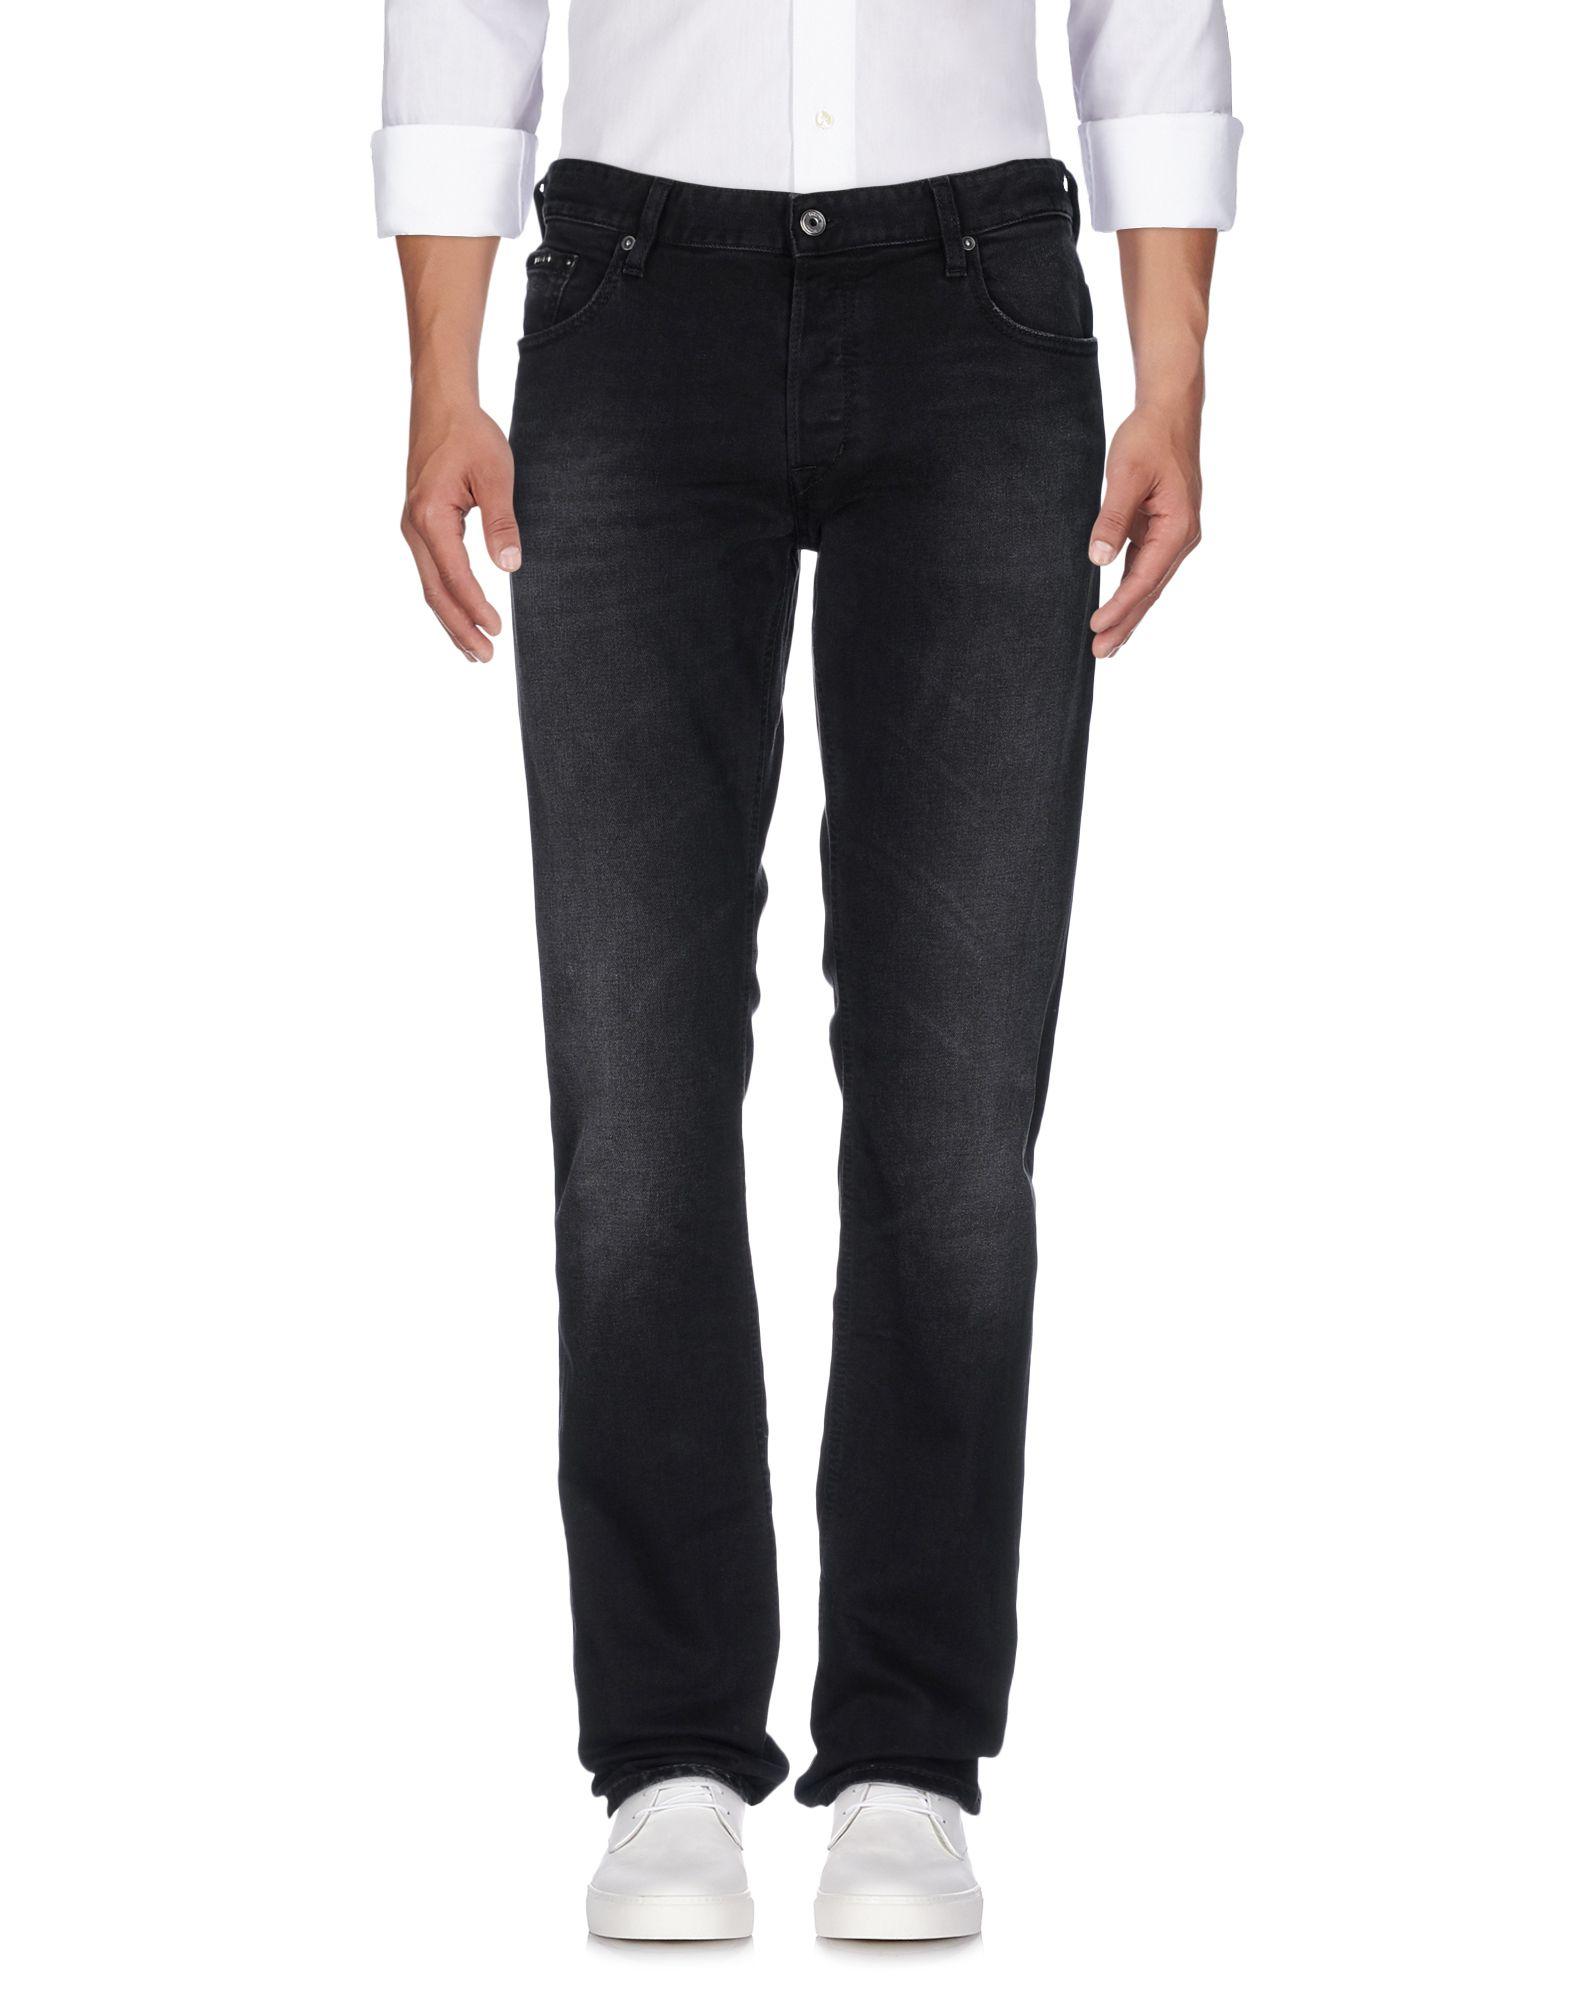 Pantaloni Jeans Just Cavalli Uomo - Acquista online su